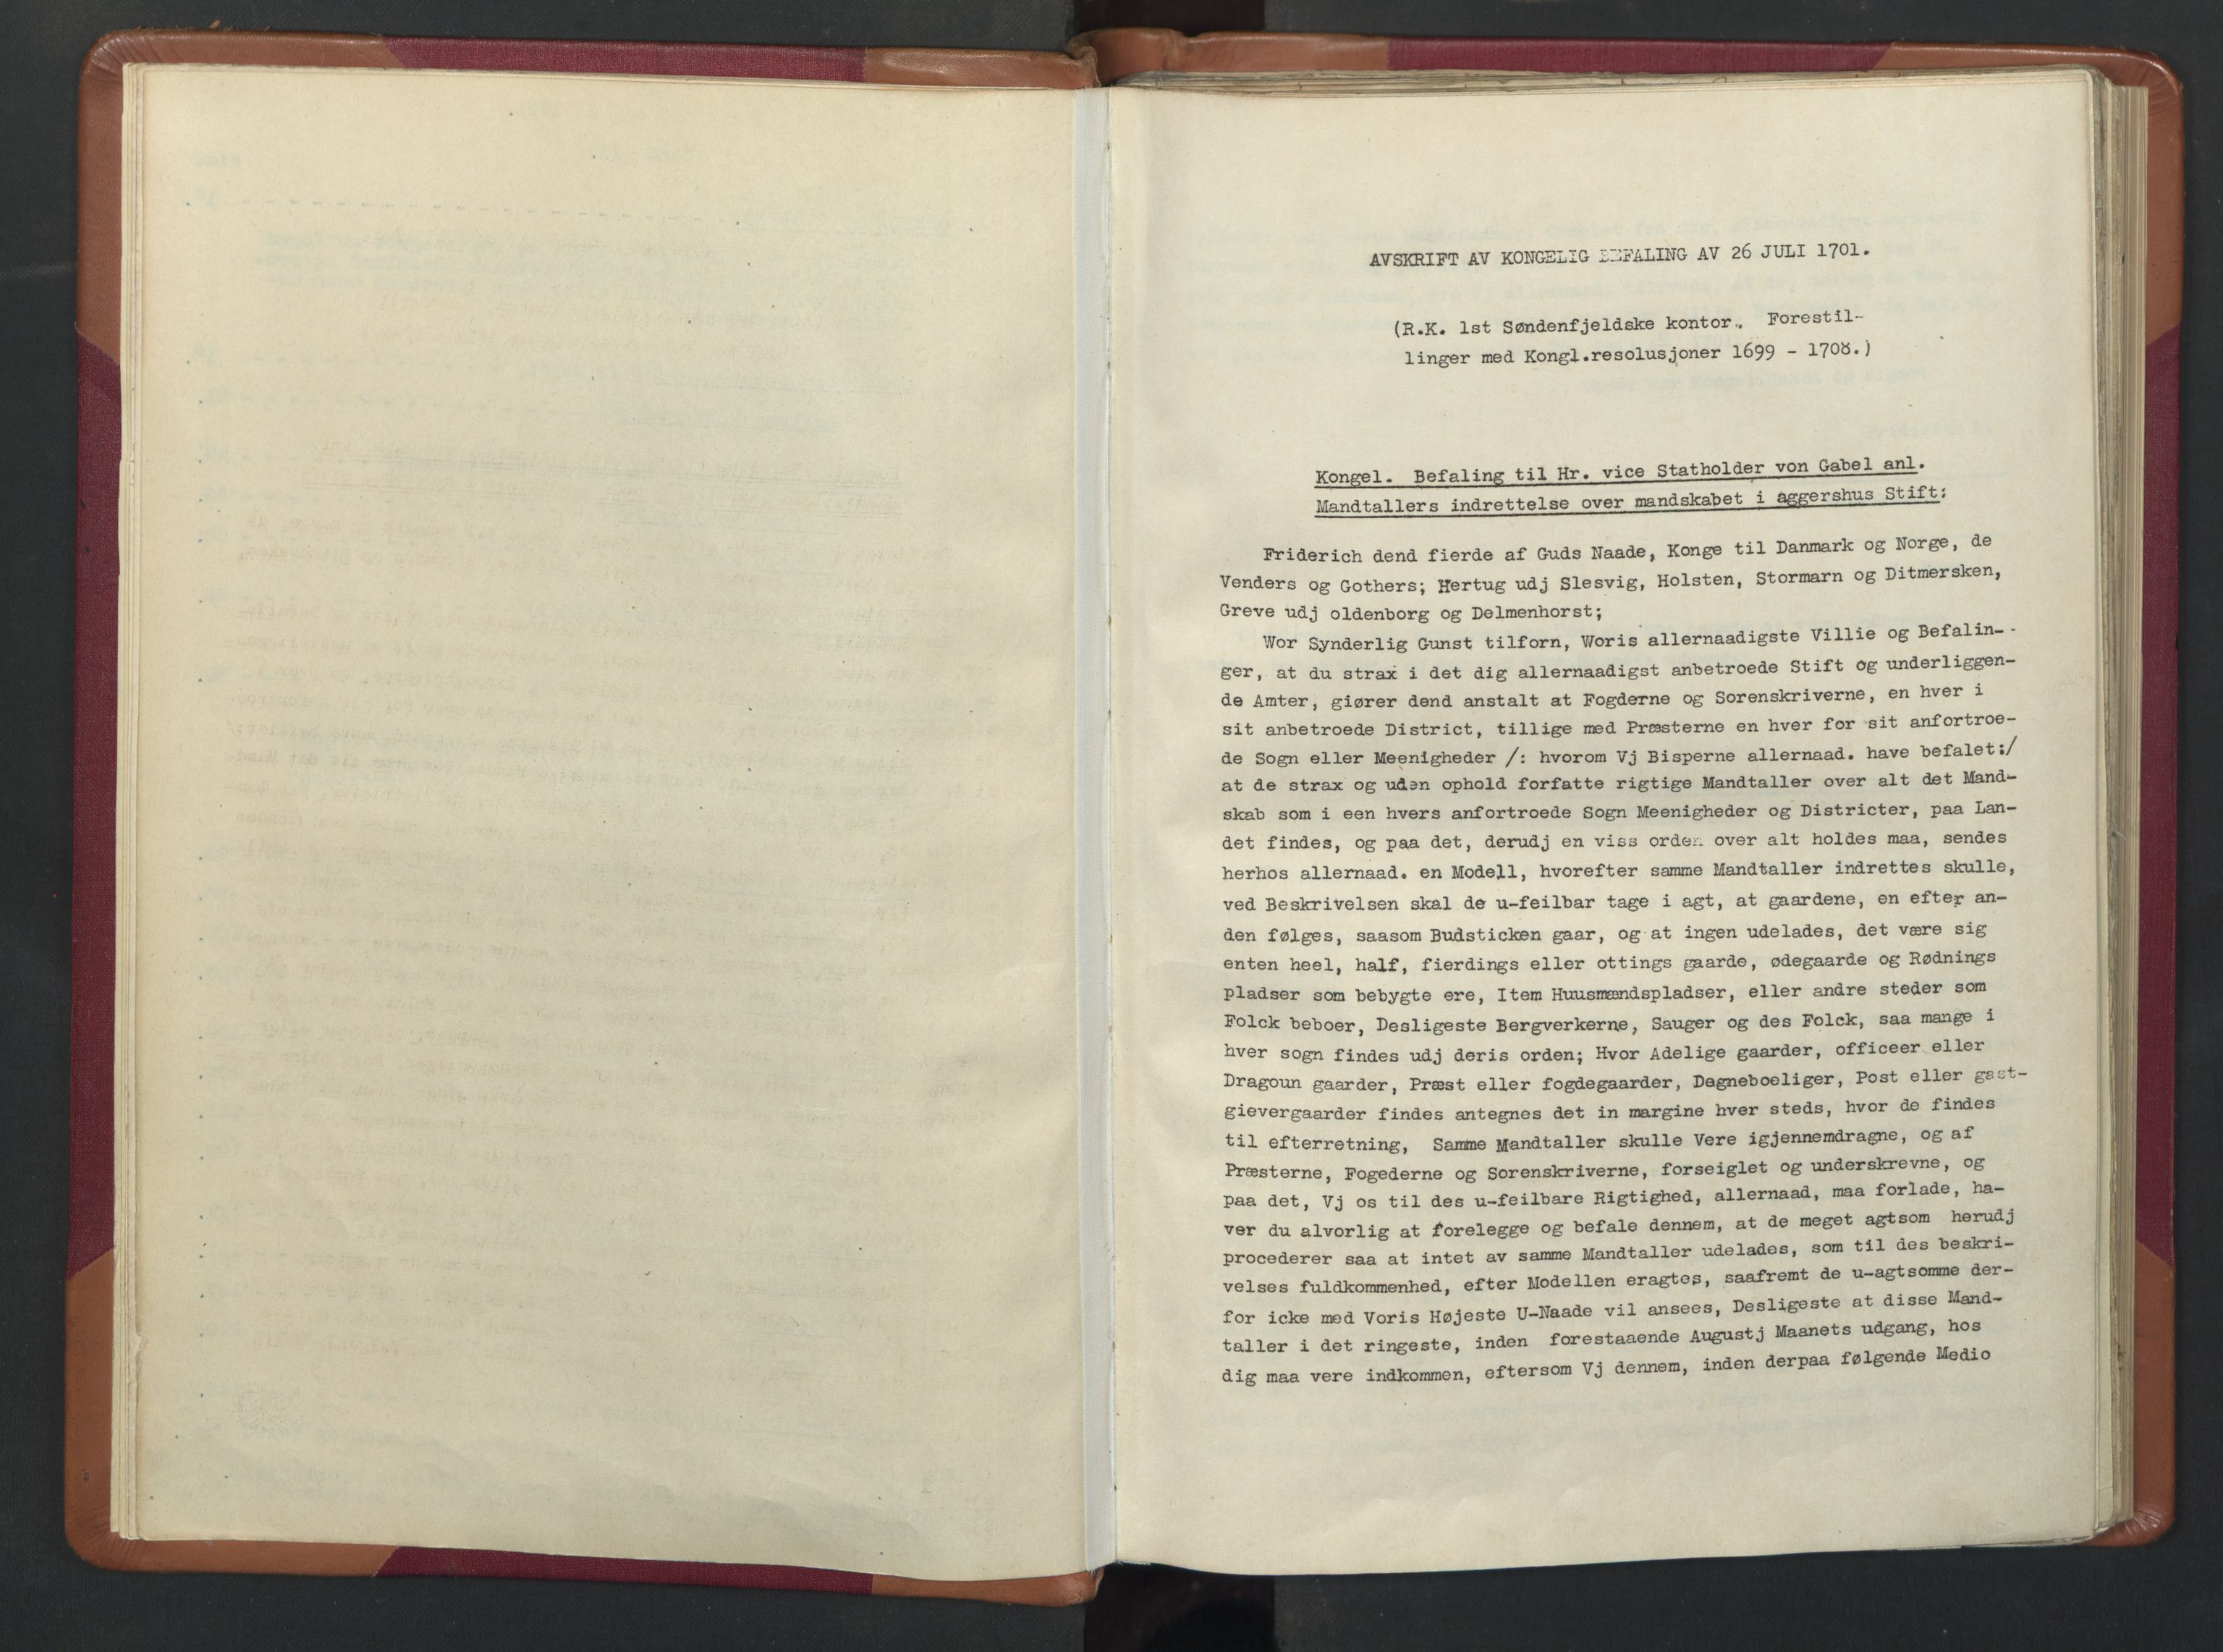 RA, Manntallet 1701, nr. 13: Orkdal fogderi og Gauldal fogderi med Røros kobberverk, 1701, s. upaginert